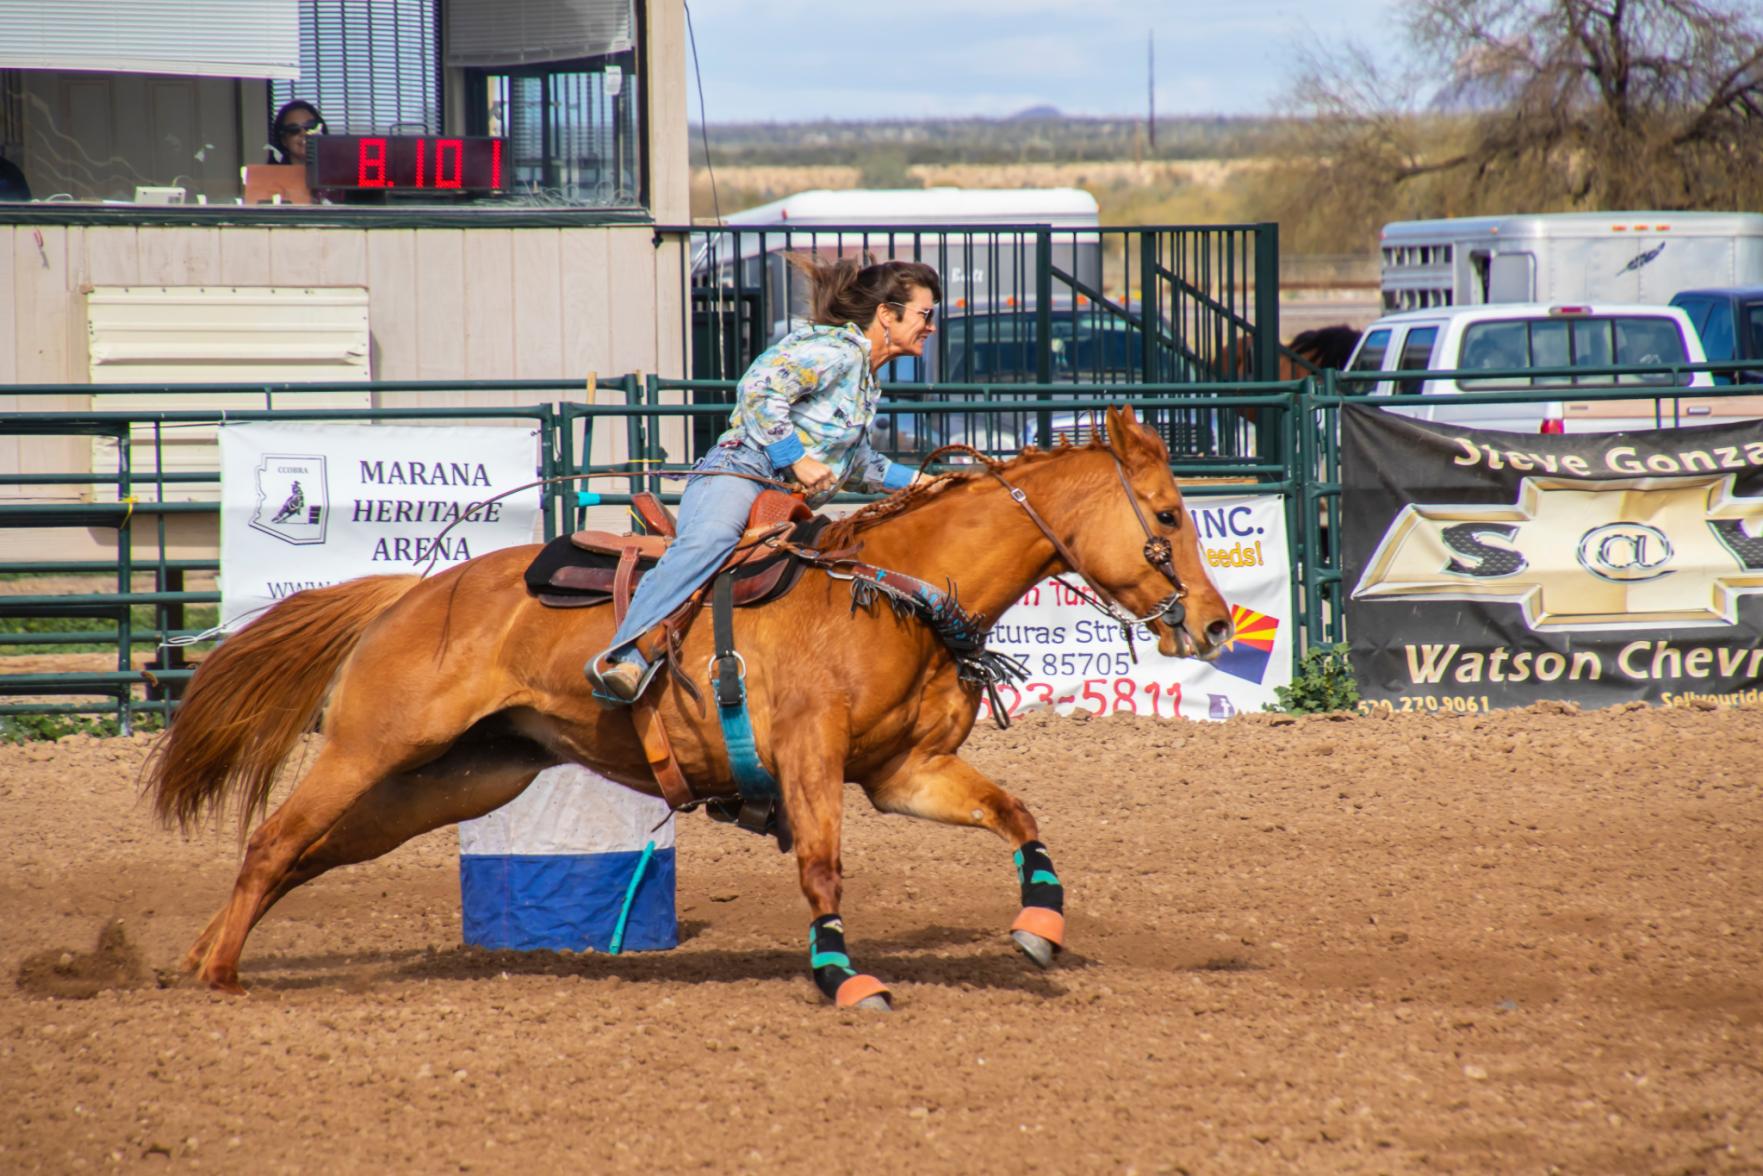 Winners Ride At The Marana Heritage Arena News Tucsonlocalmedia Com